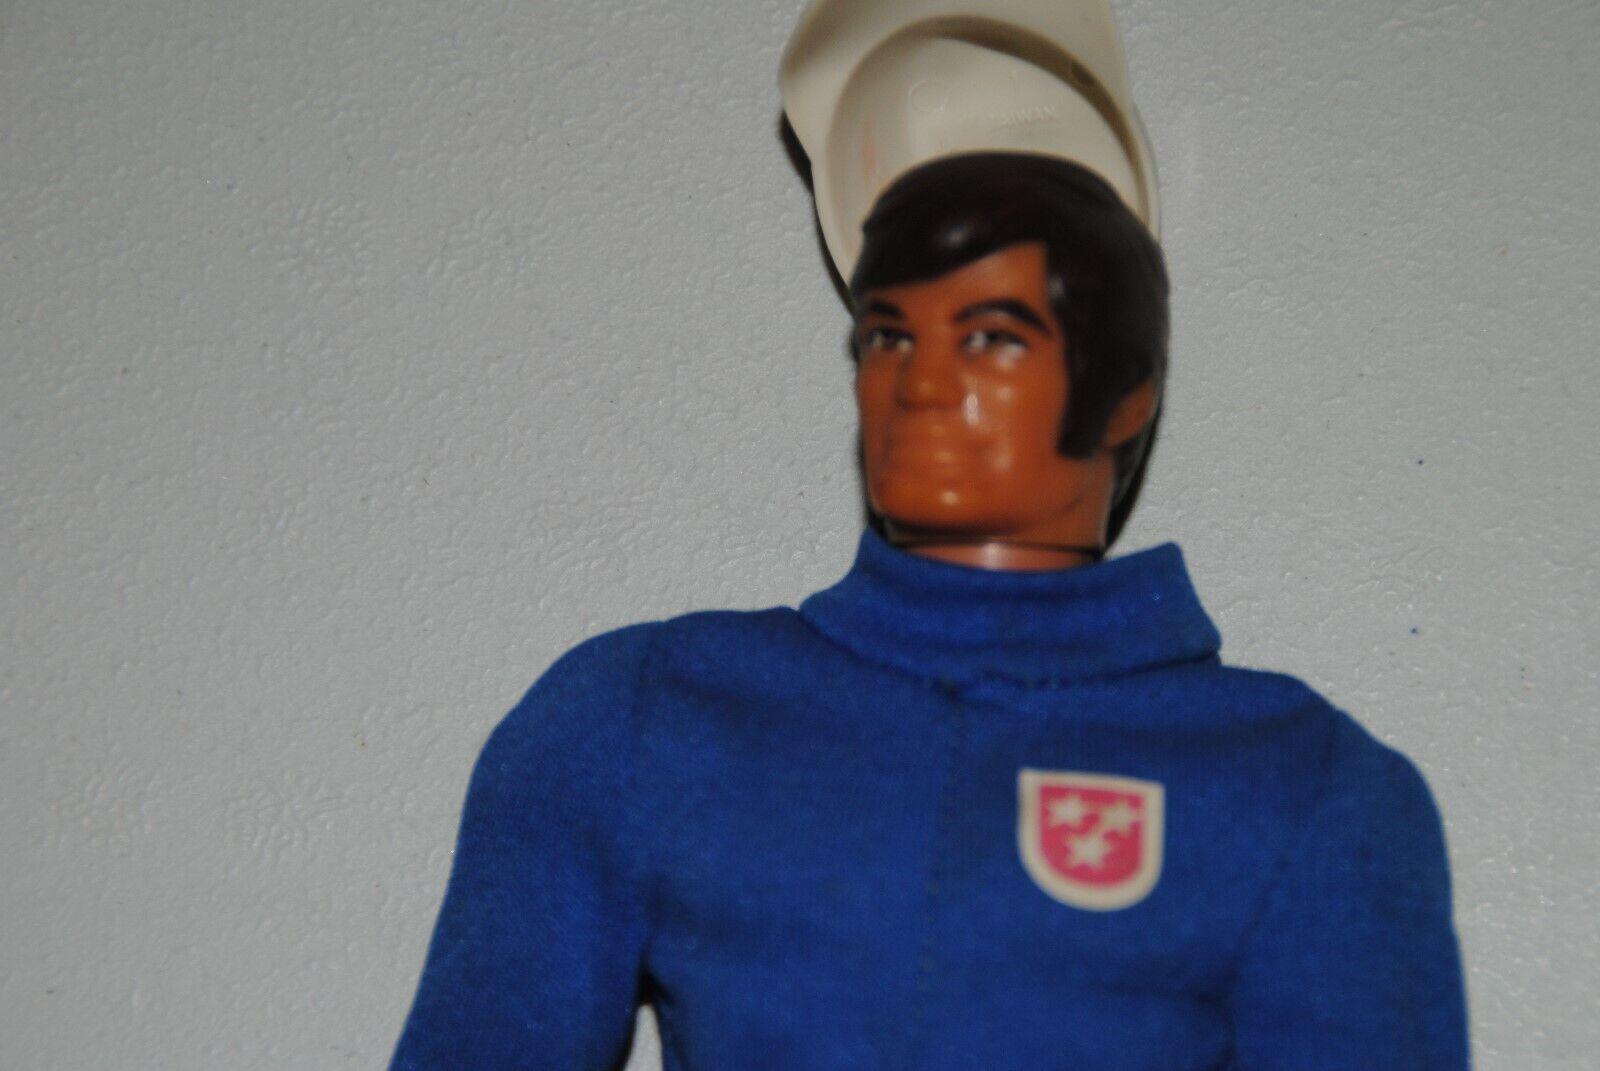 BIG JIM MATTEL CIPSA KID ACERO MEXICAN FIGURE   Blau JUMPSUIT     RARE